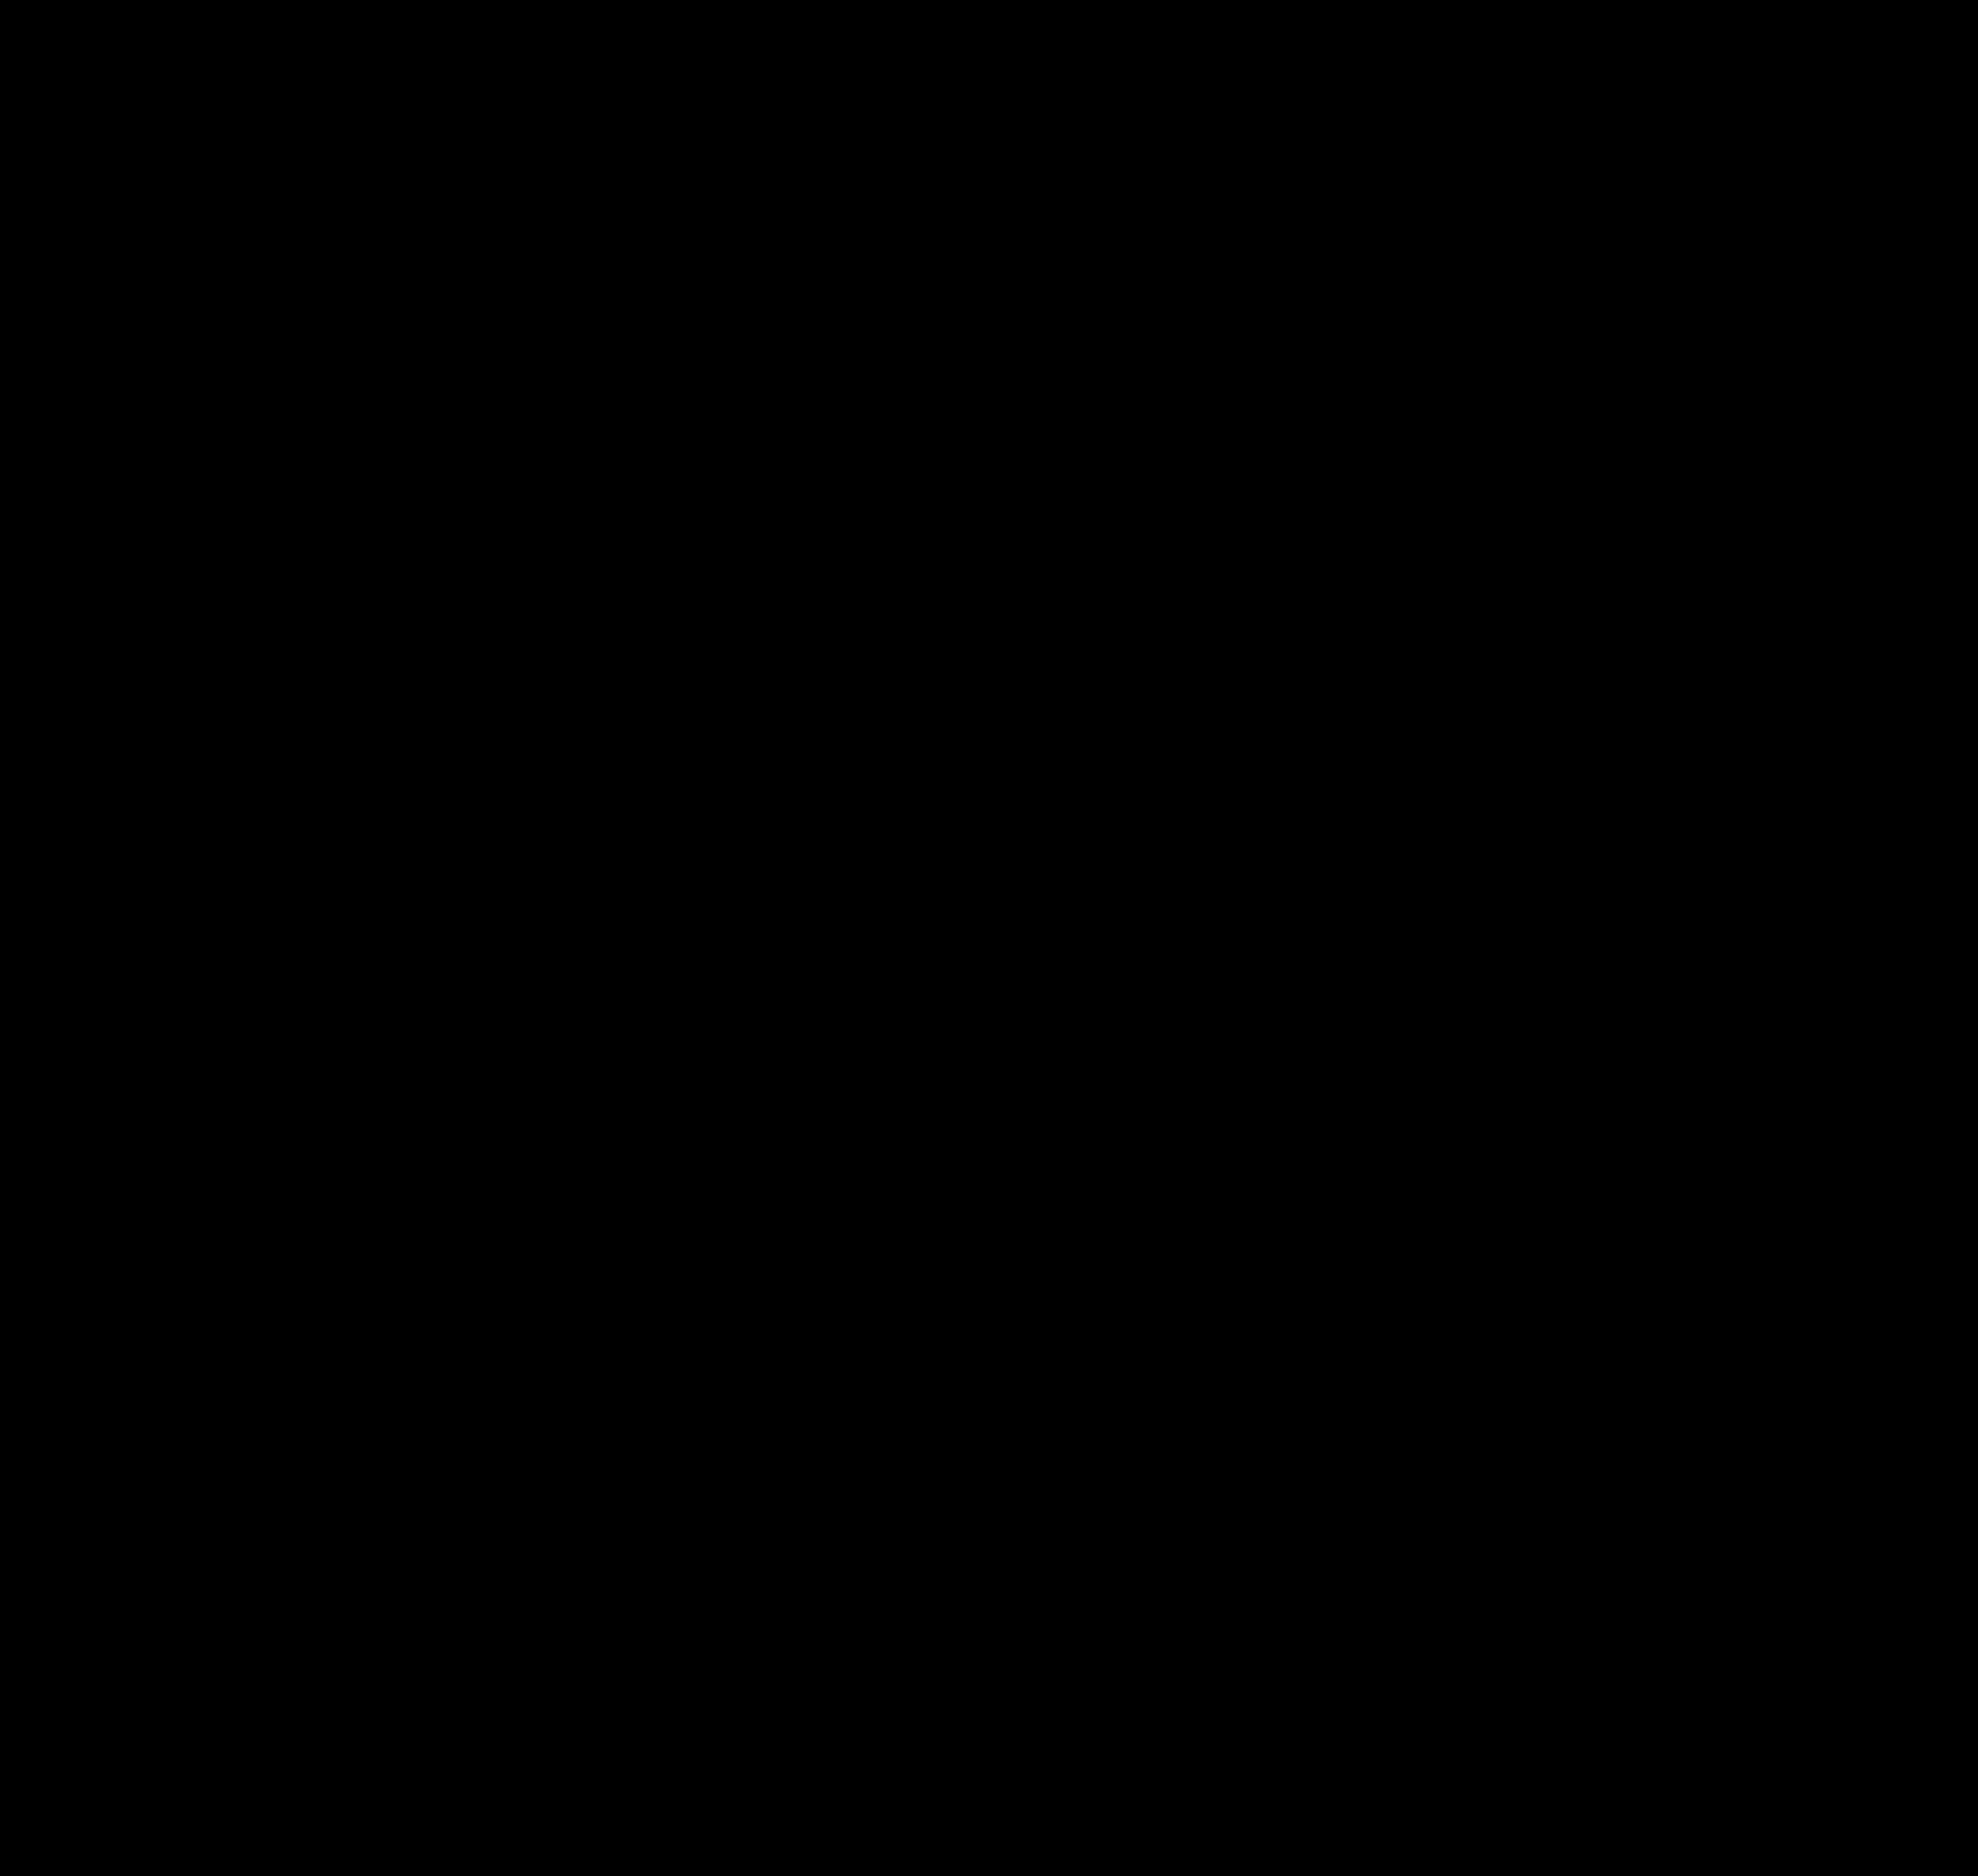 667Mad_LogoFinal (symbol-black).png